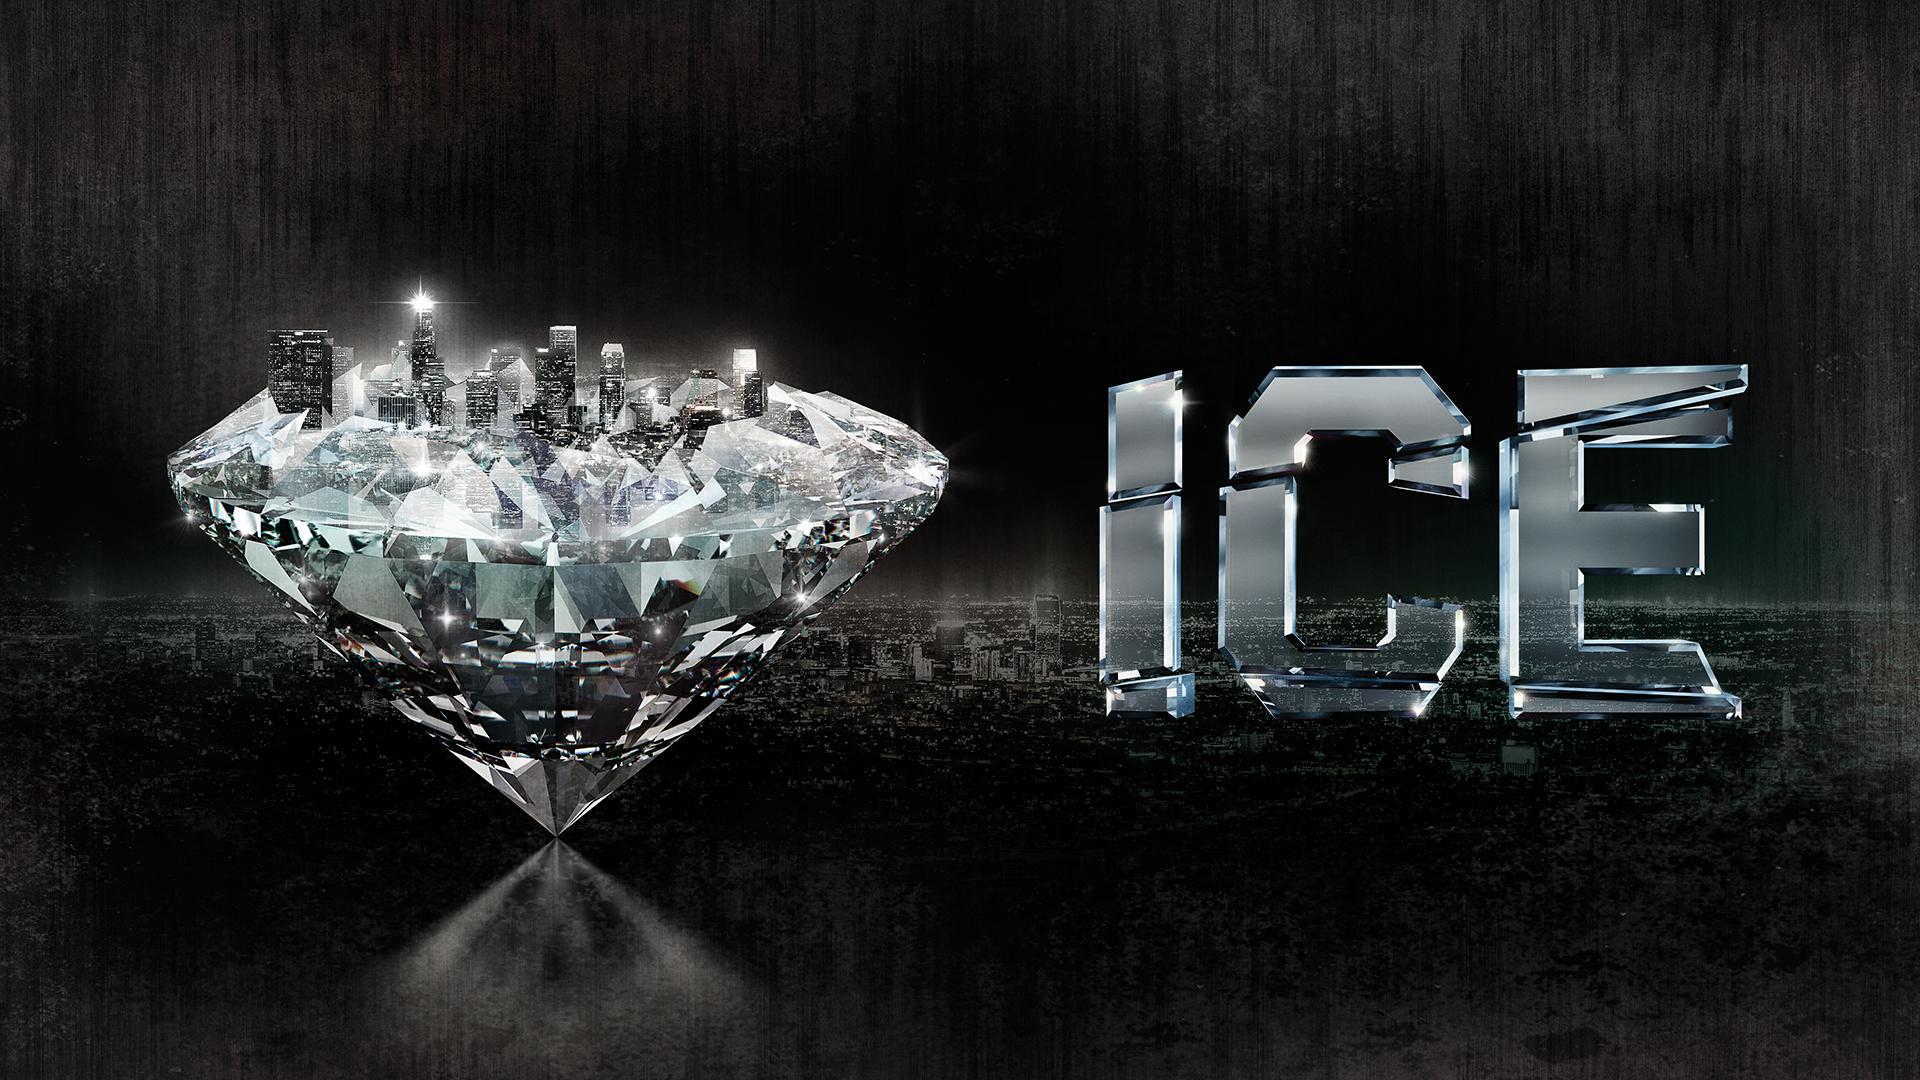 Ice_02-1.jpg